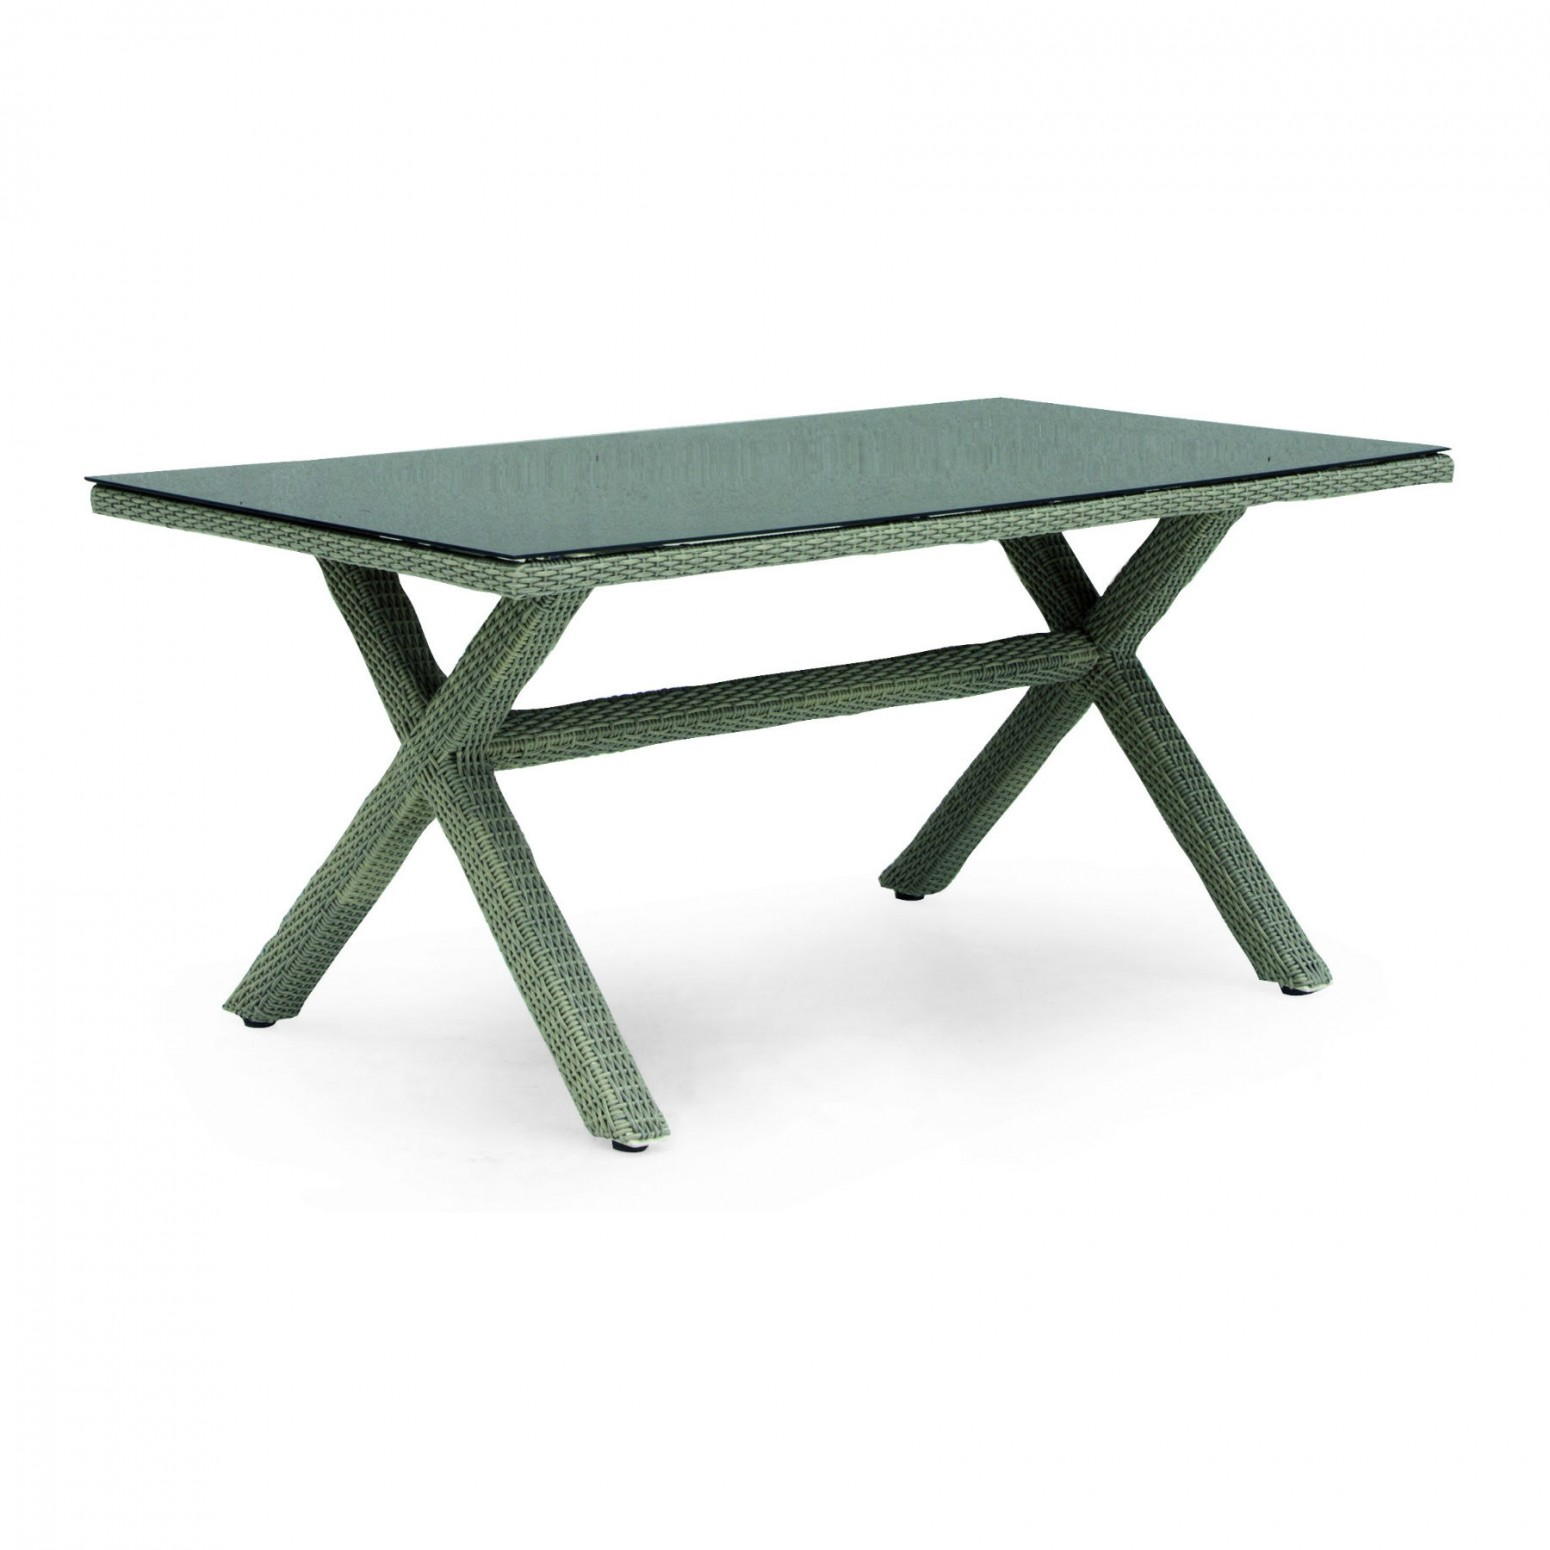 table de jardin 6 personnes en resine tressee